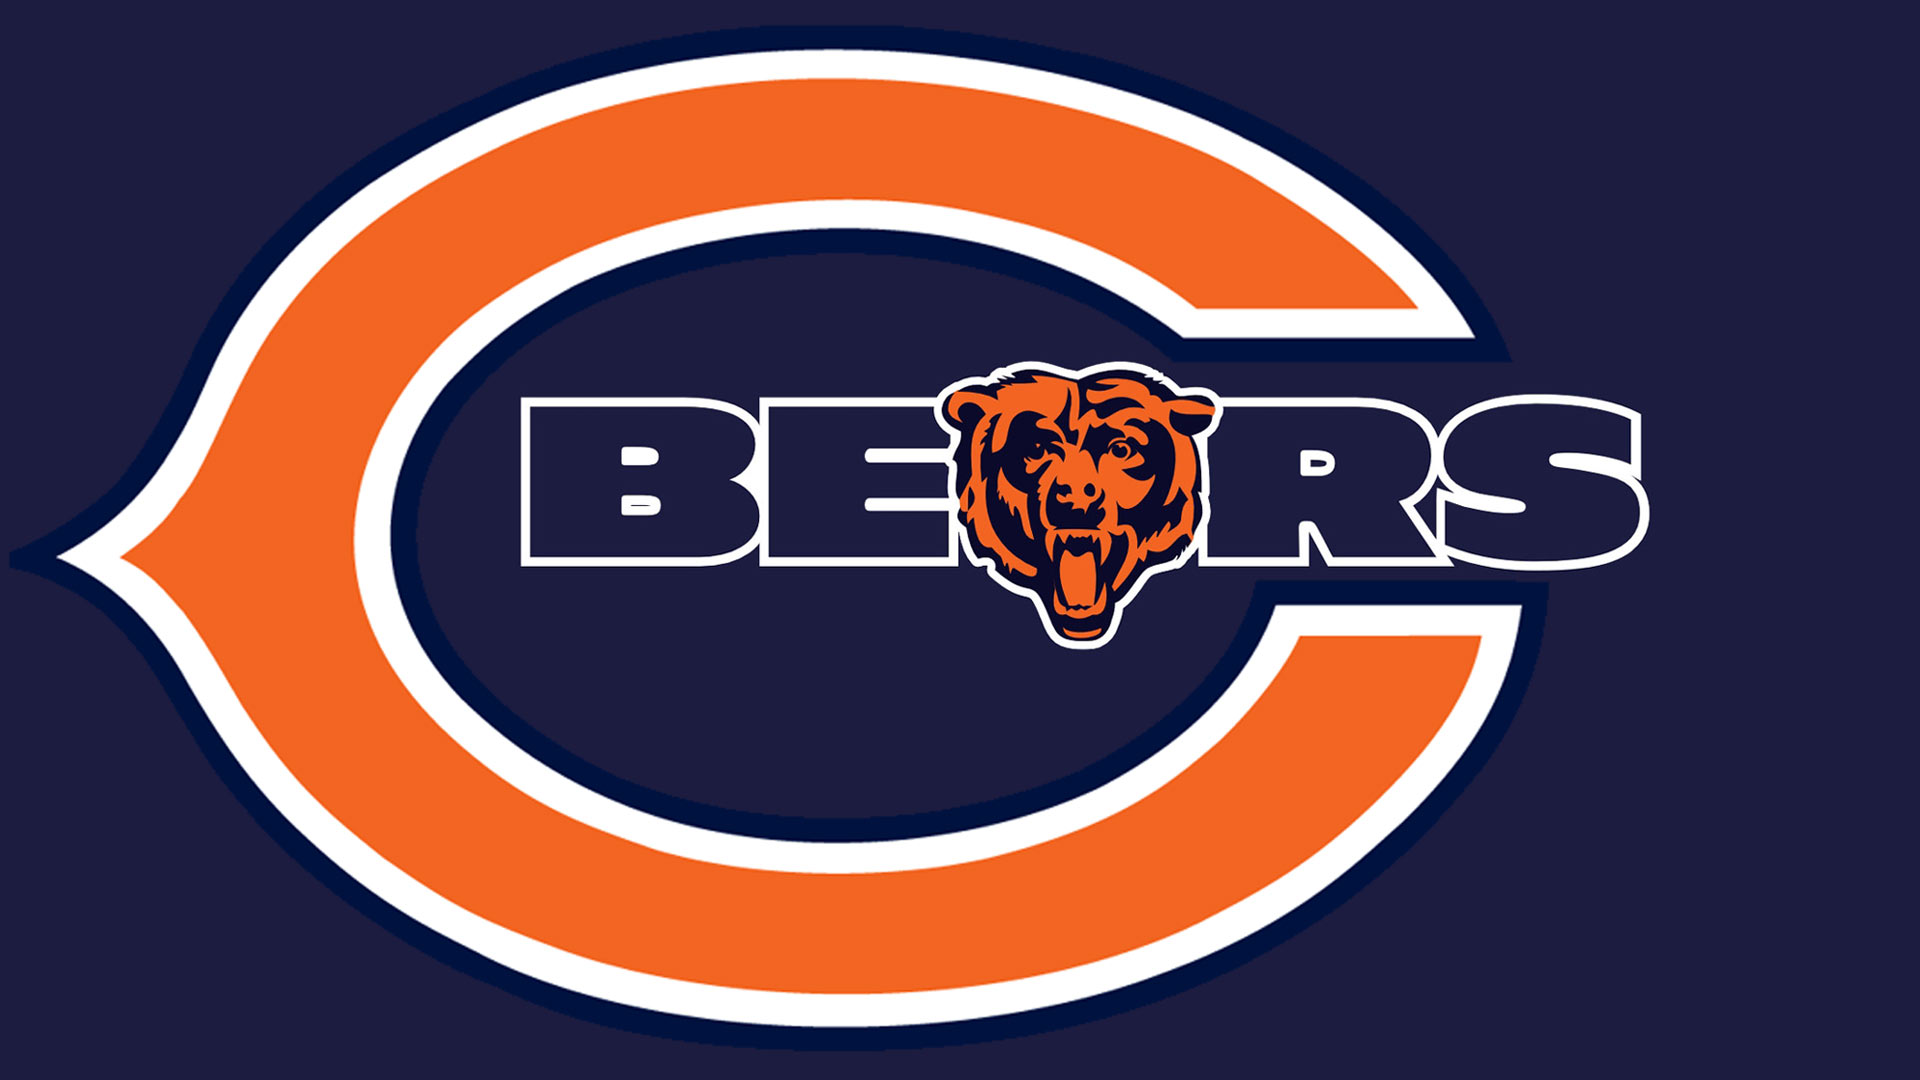 download Download Chicago Bears logo Hd 1080p Wallpaper 1920x1080